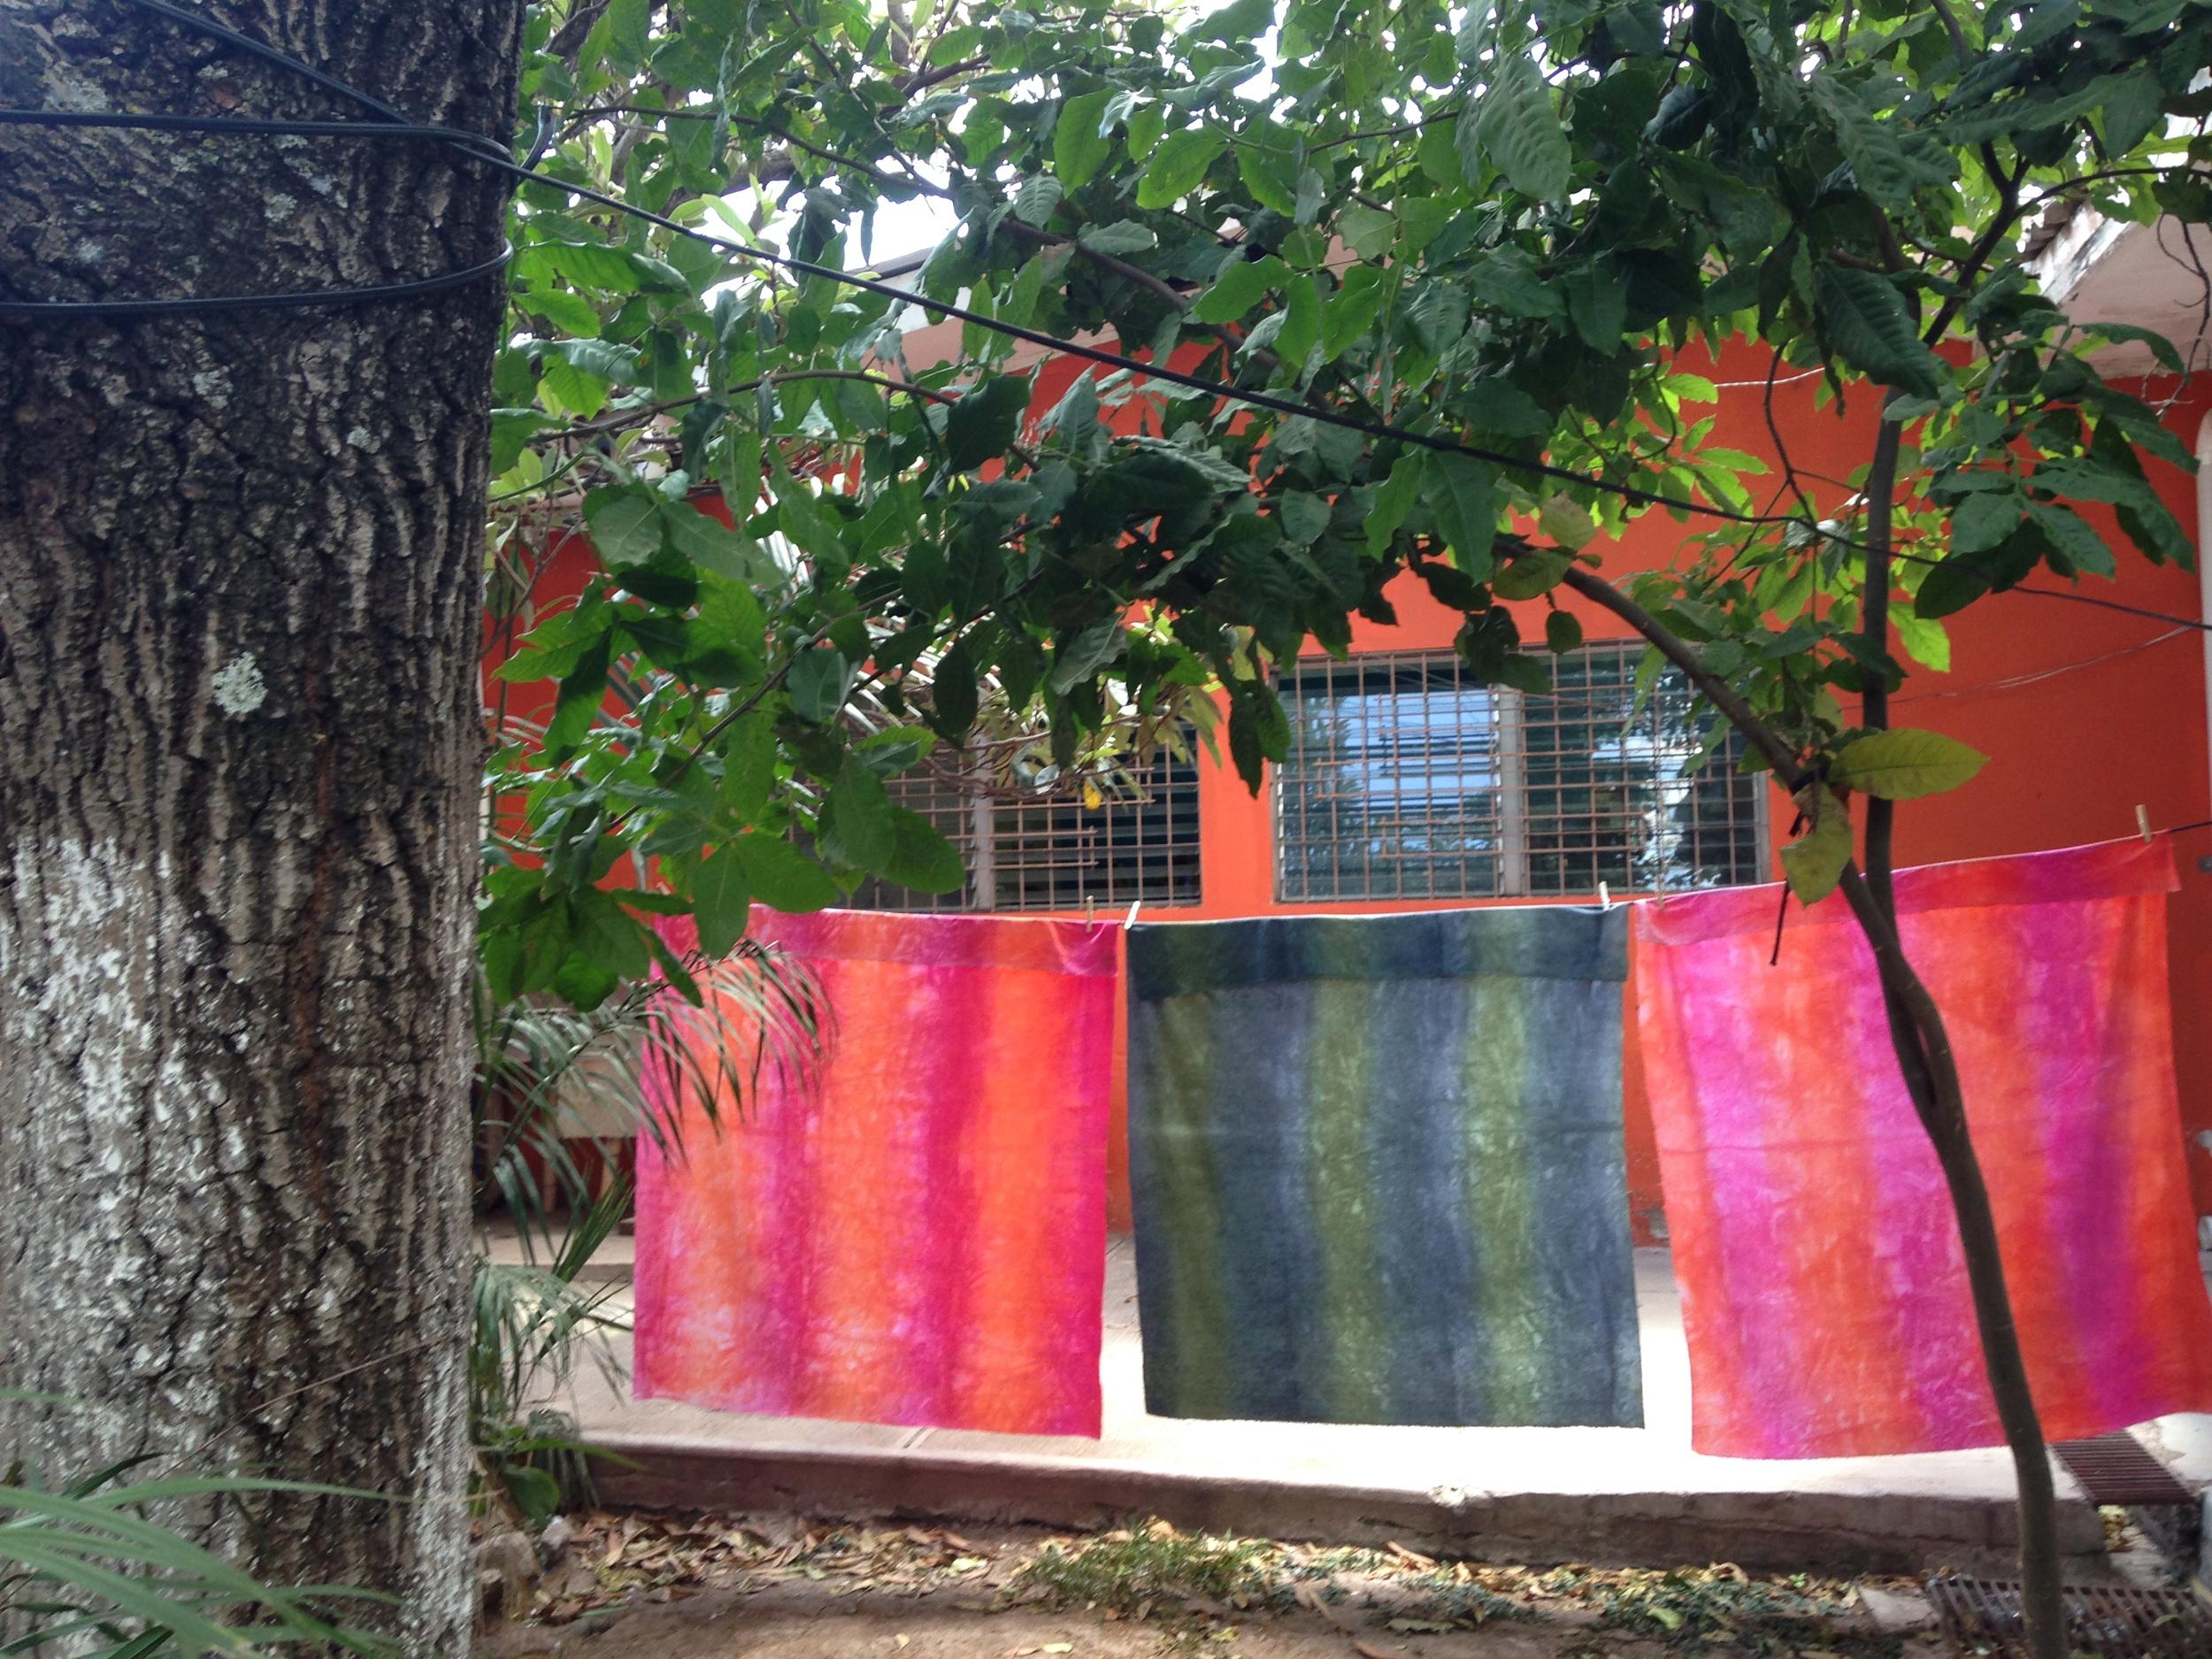 2015 Shibori dyed fabric by Dilcia